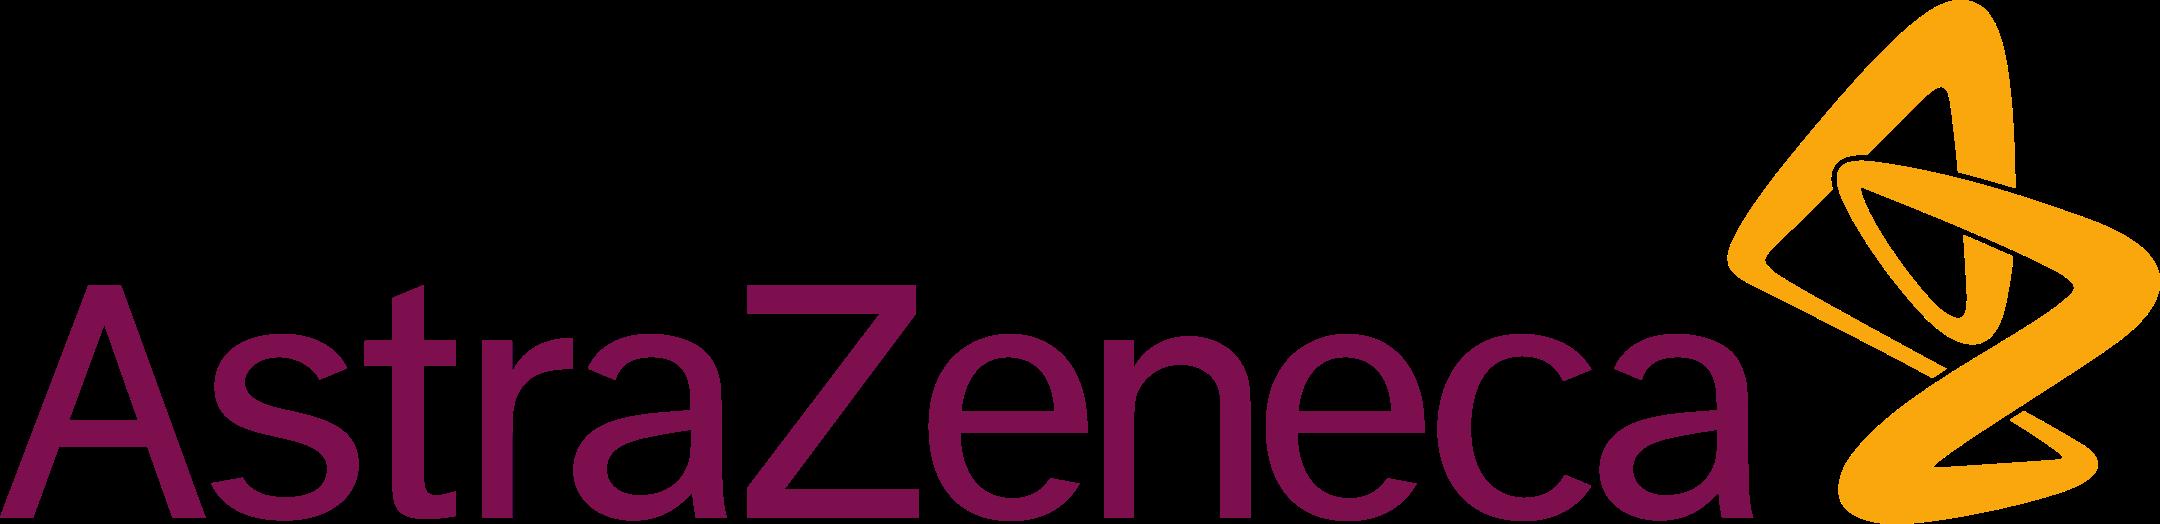 astrazeneca logo 1 - AstraZeneca Logo